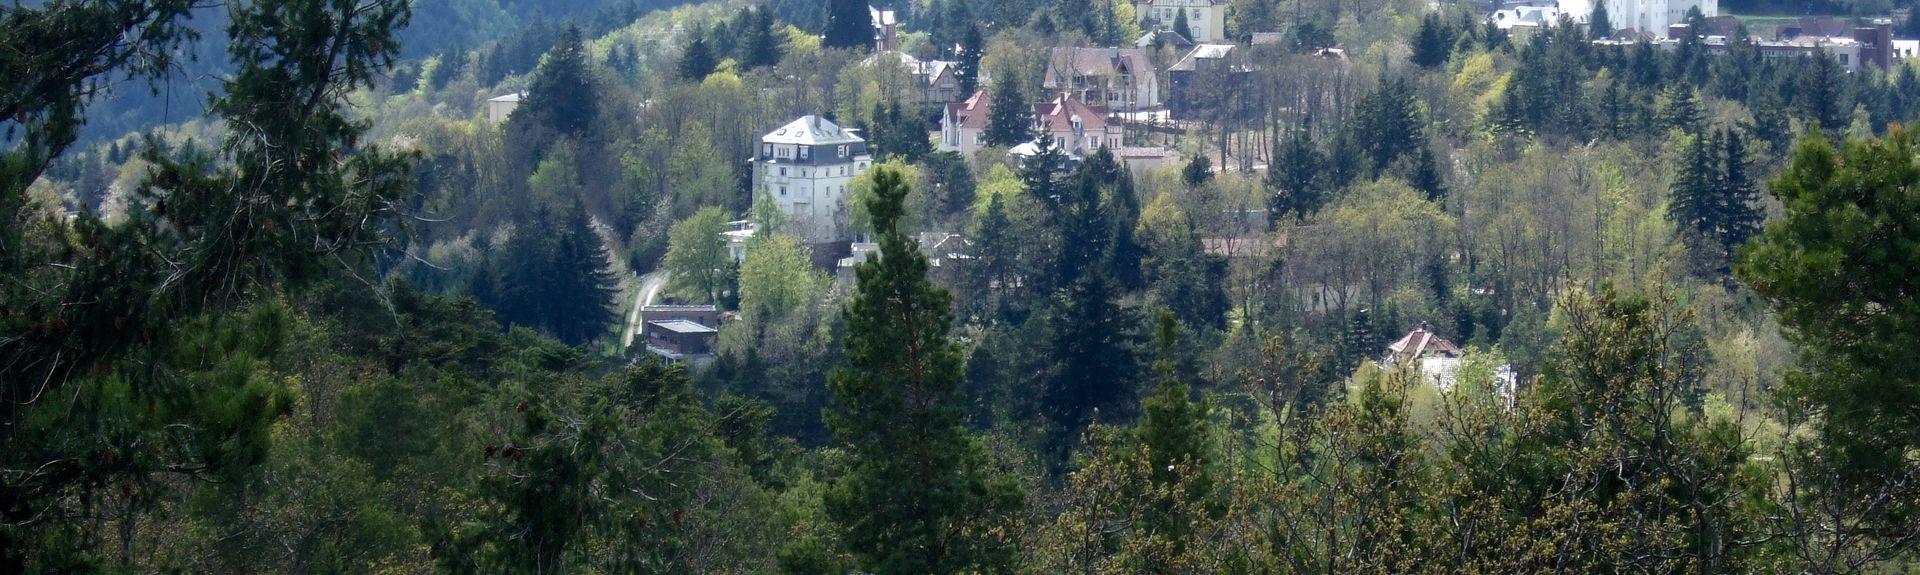 Bennwihr, Haut-Rhin (department), France